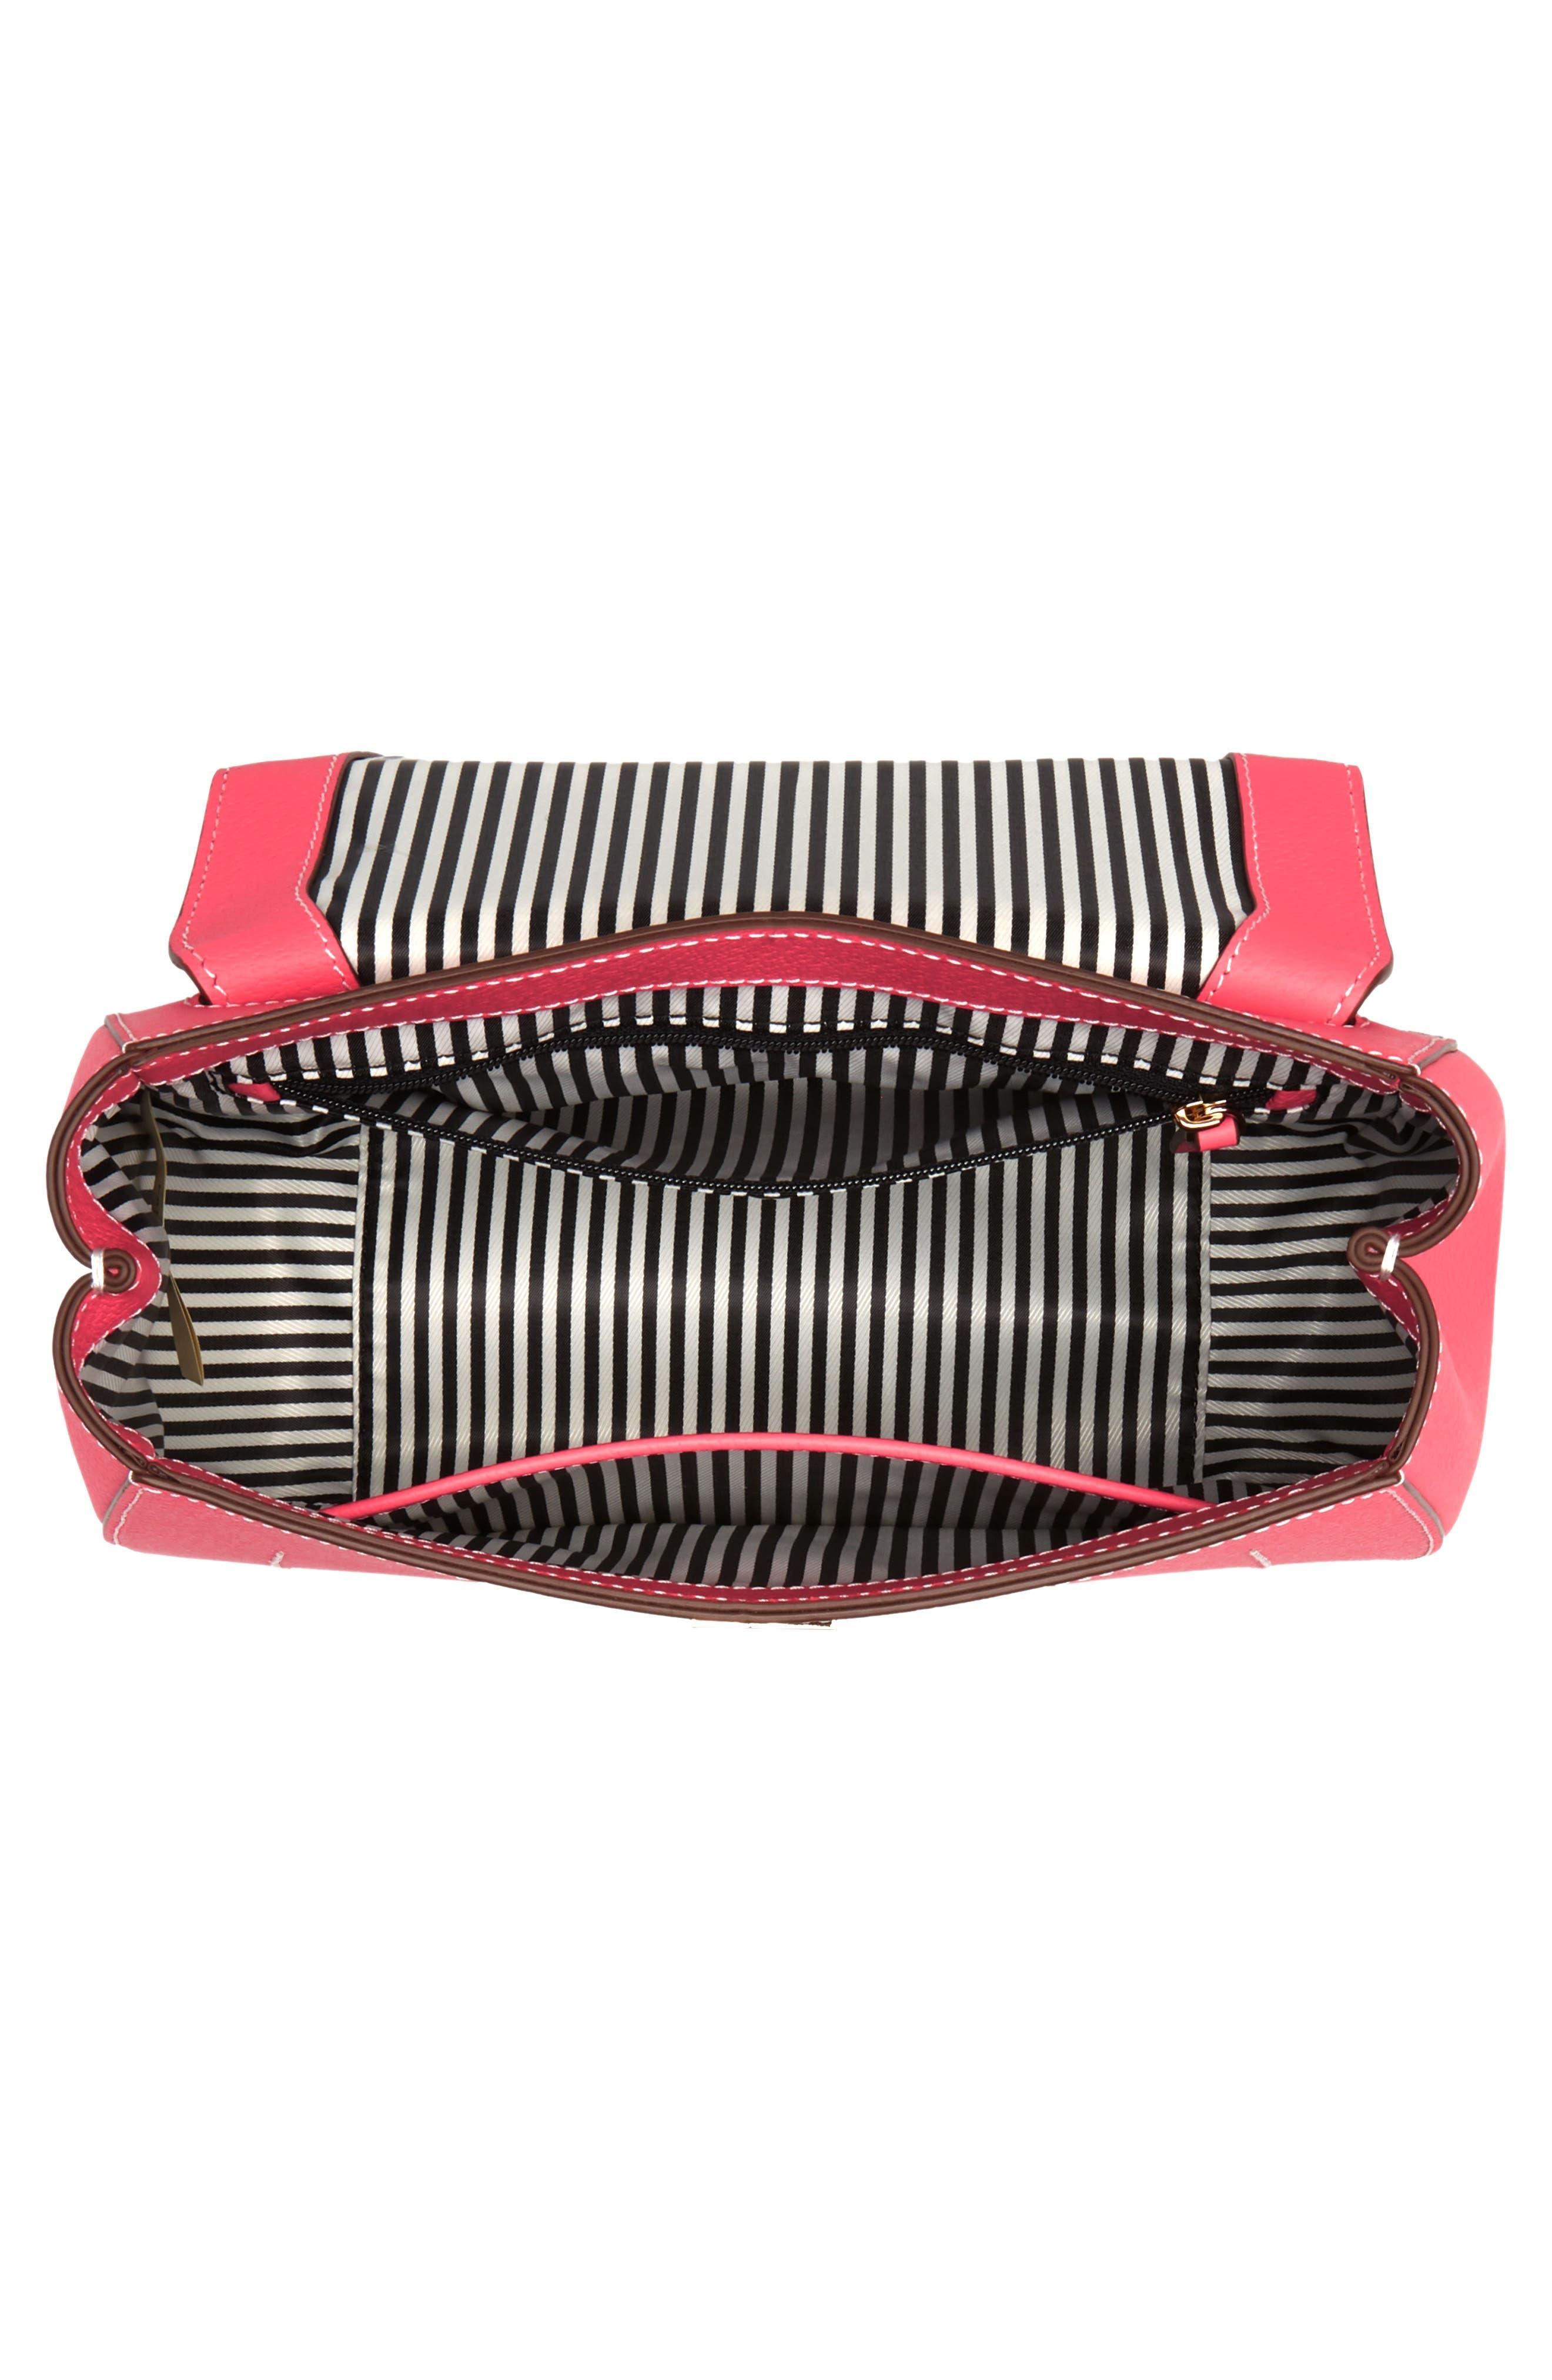 thompson street - justina leather satchel,                             Alternate thumbnail 4, color,                             650